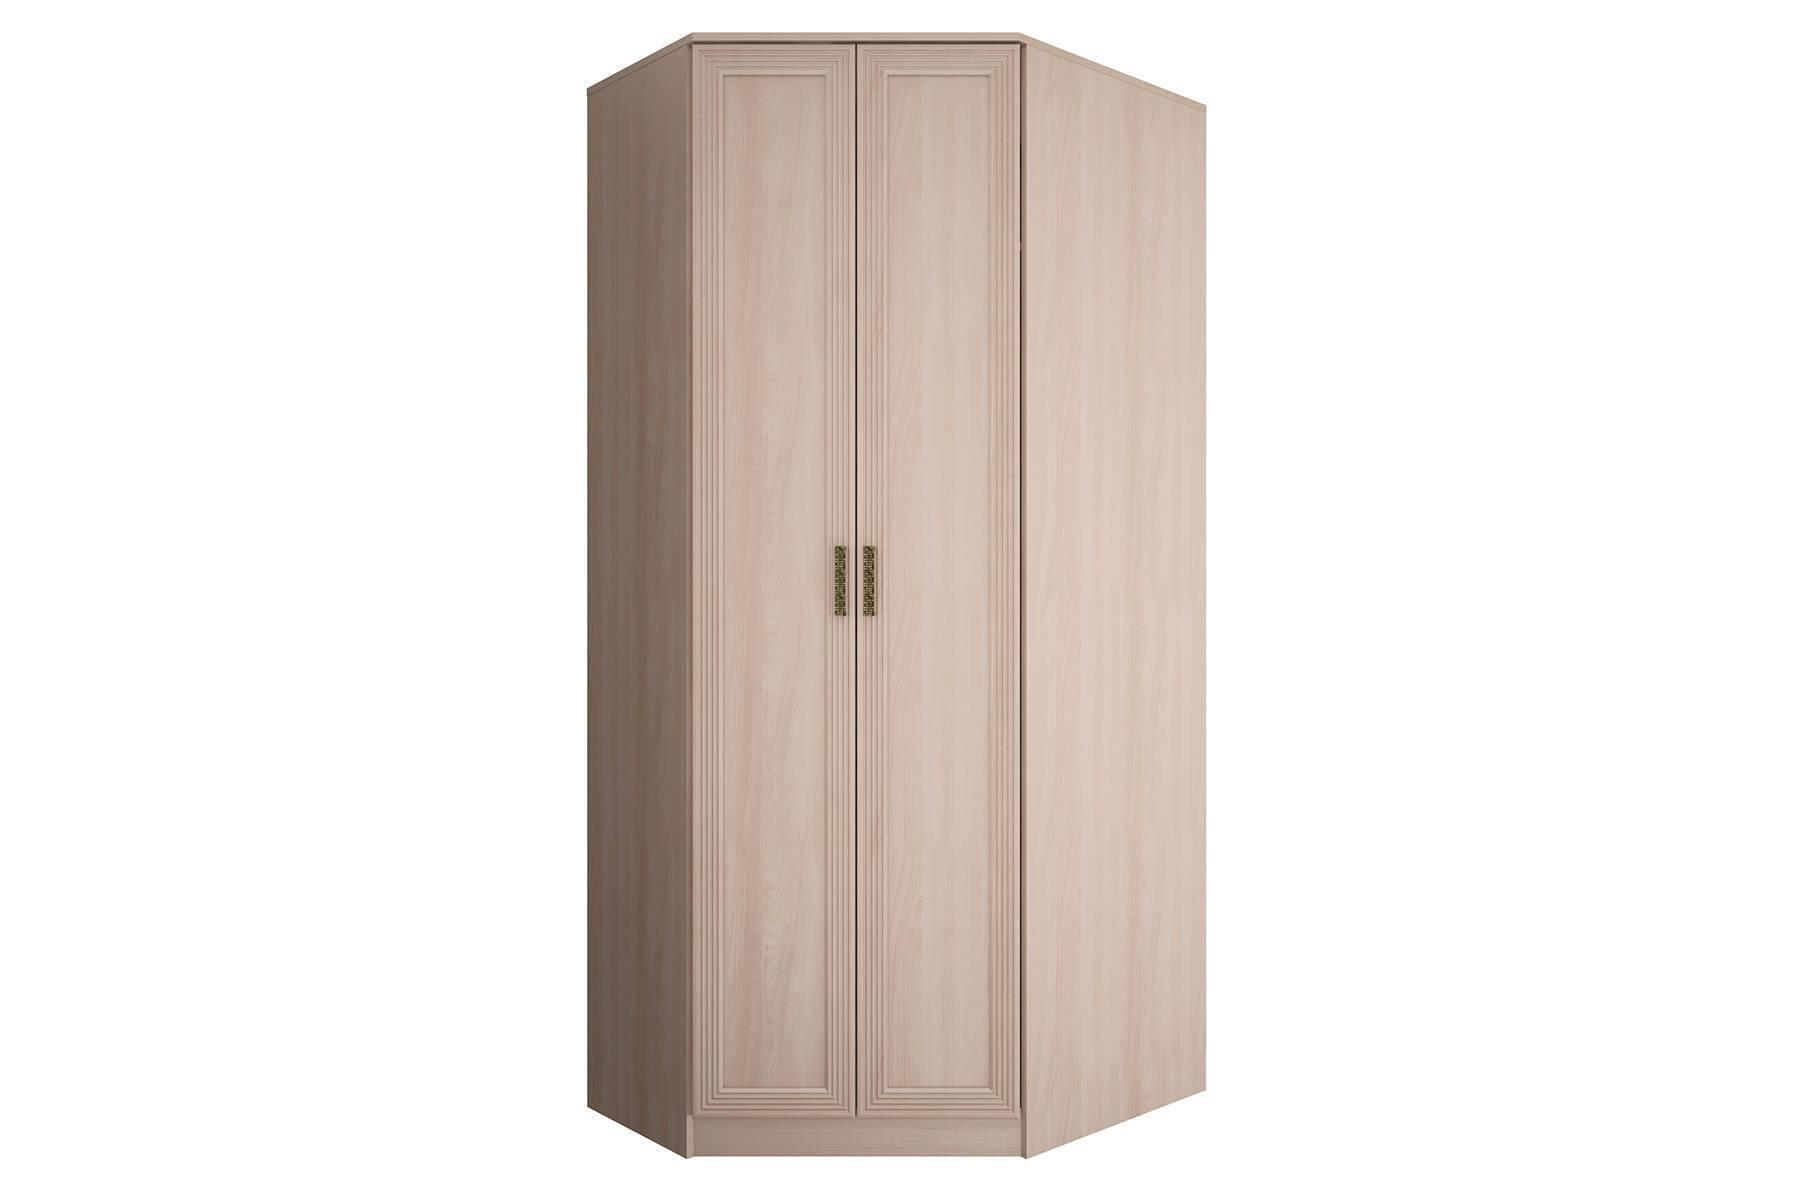 Шкаф угловой левый Орион шкаф угловой орион 109 01